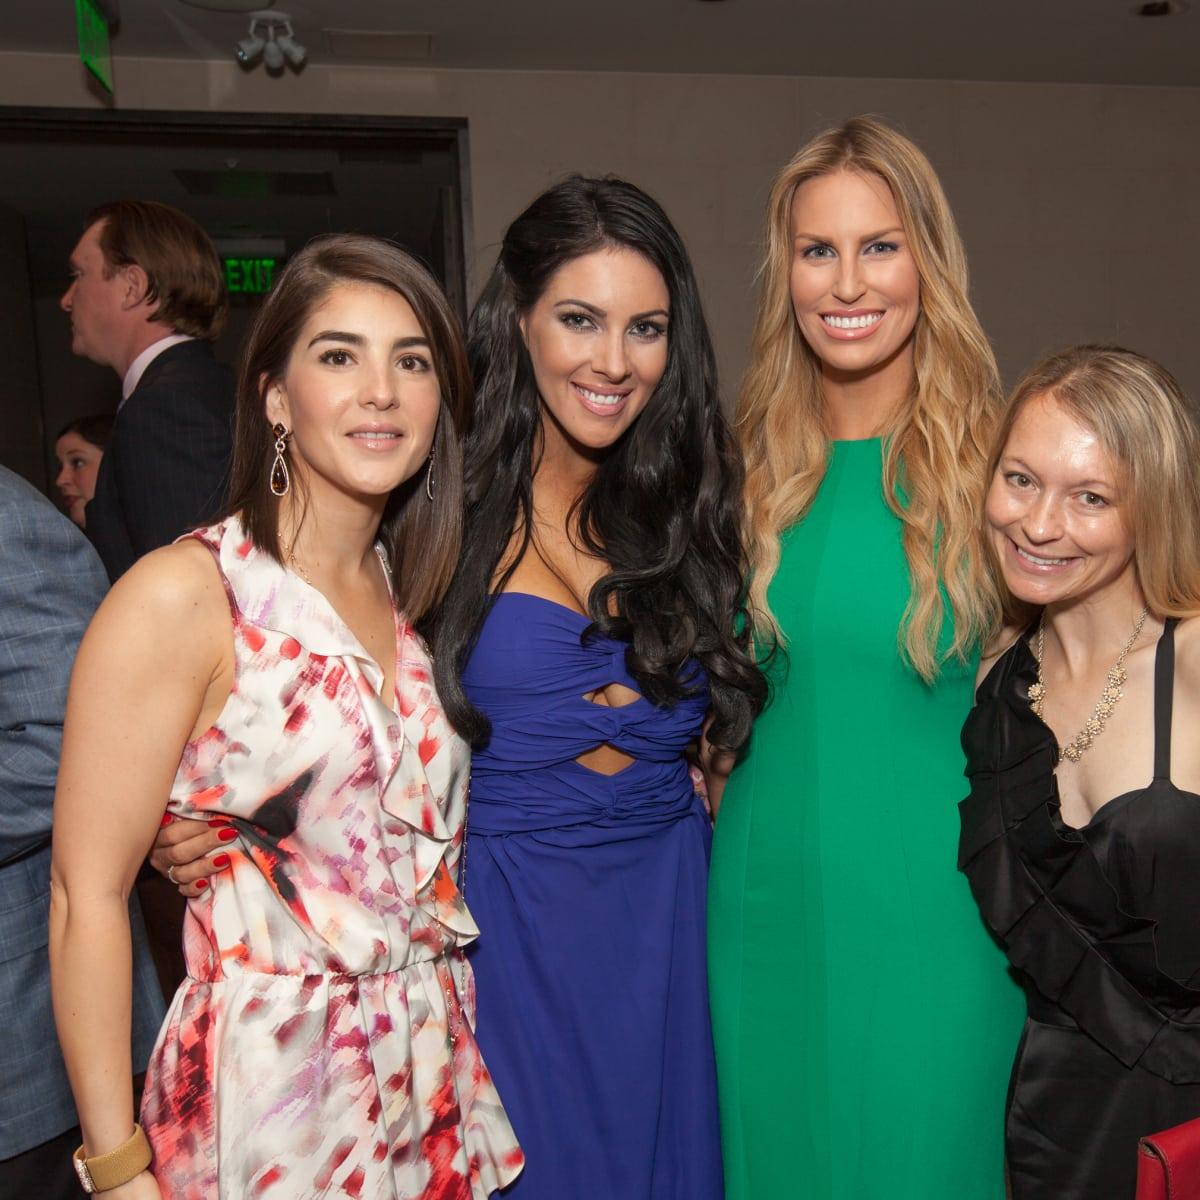 Houston, Homemade Hope's Spring Soiree, May 2016, Kristina Rosenwasser, Janessa Young, Blair Bentley, Sonia Verhagen